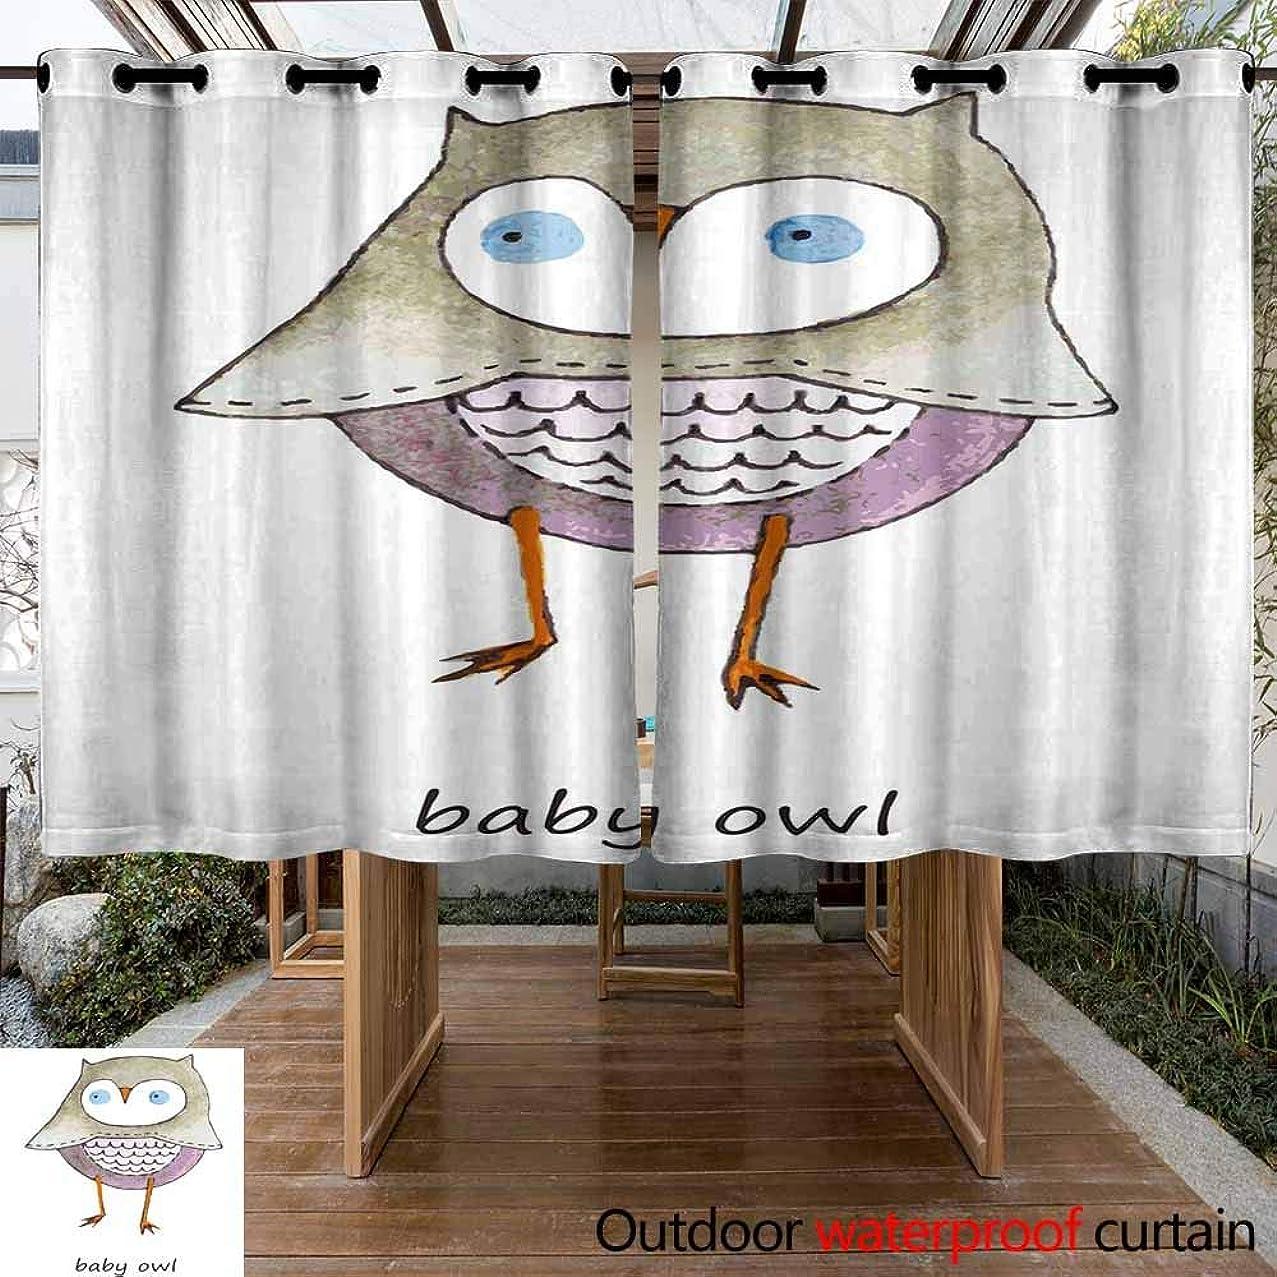 VIVIDX Patio Outdoor Curtain?UV Privacy Drape?Thick Waterproof Fabric?Heavy Duty Indoor Panel?for Porch Balcony Pergola Lanai Canopy Tent Gazebo Window, W72x45L